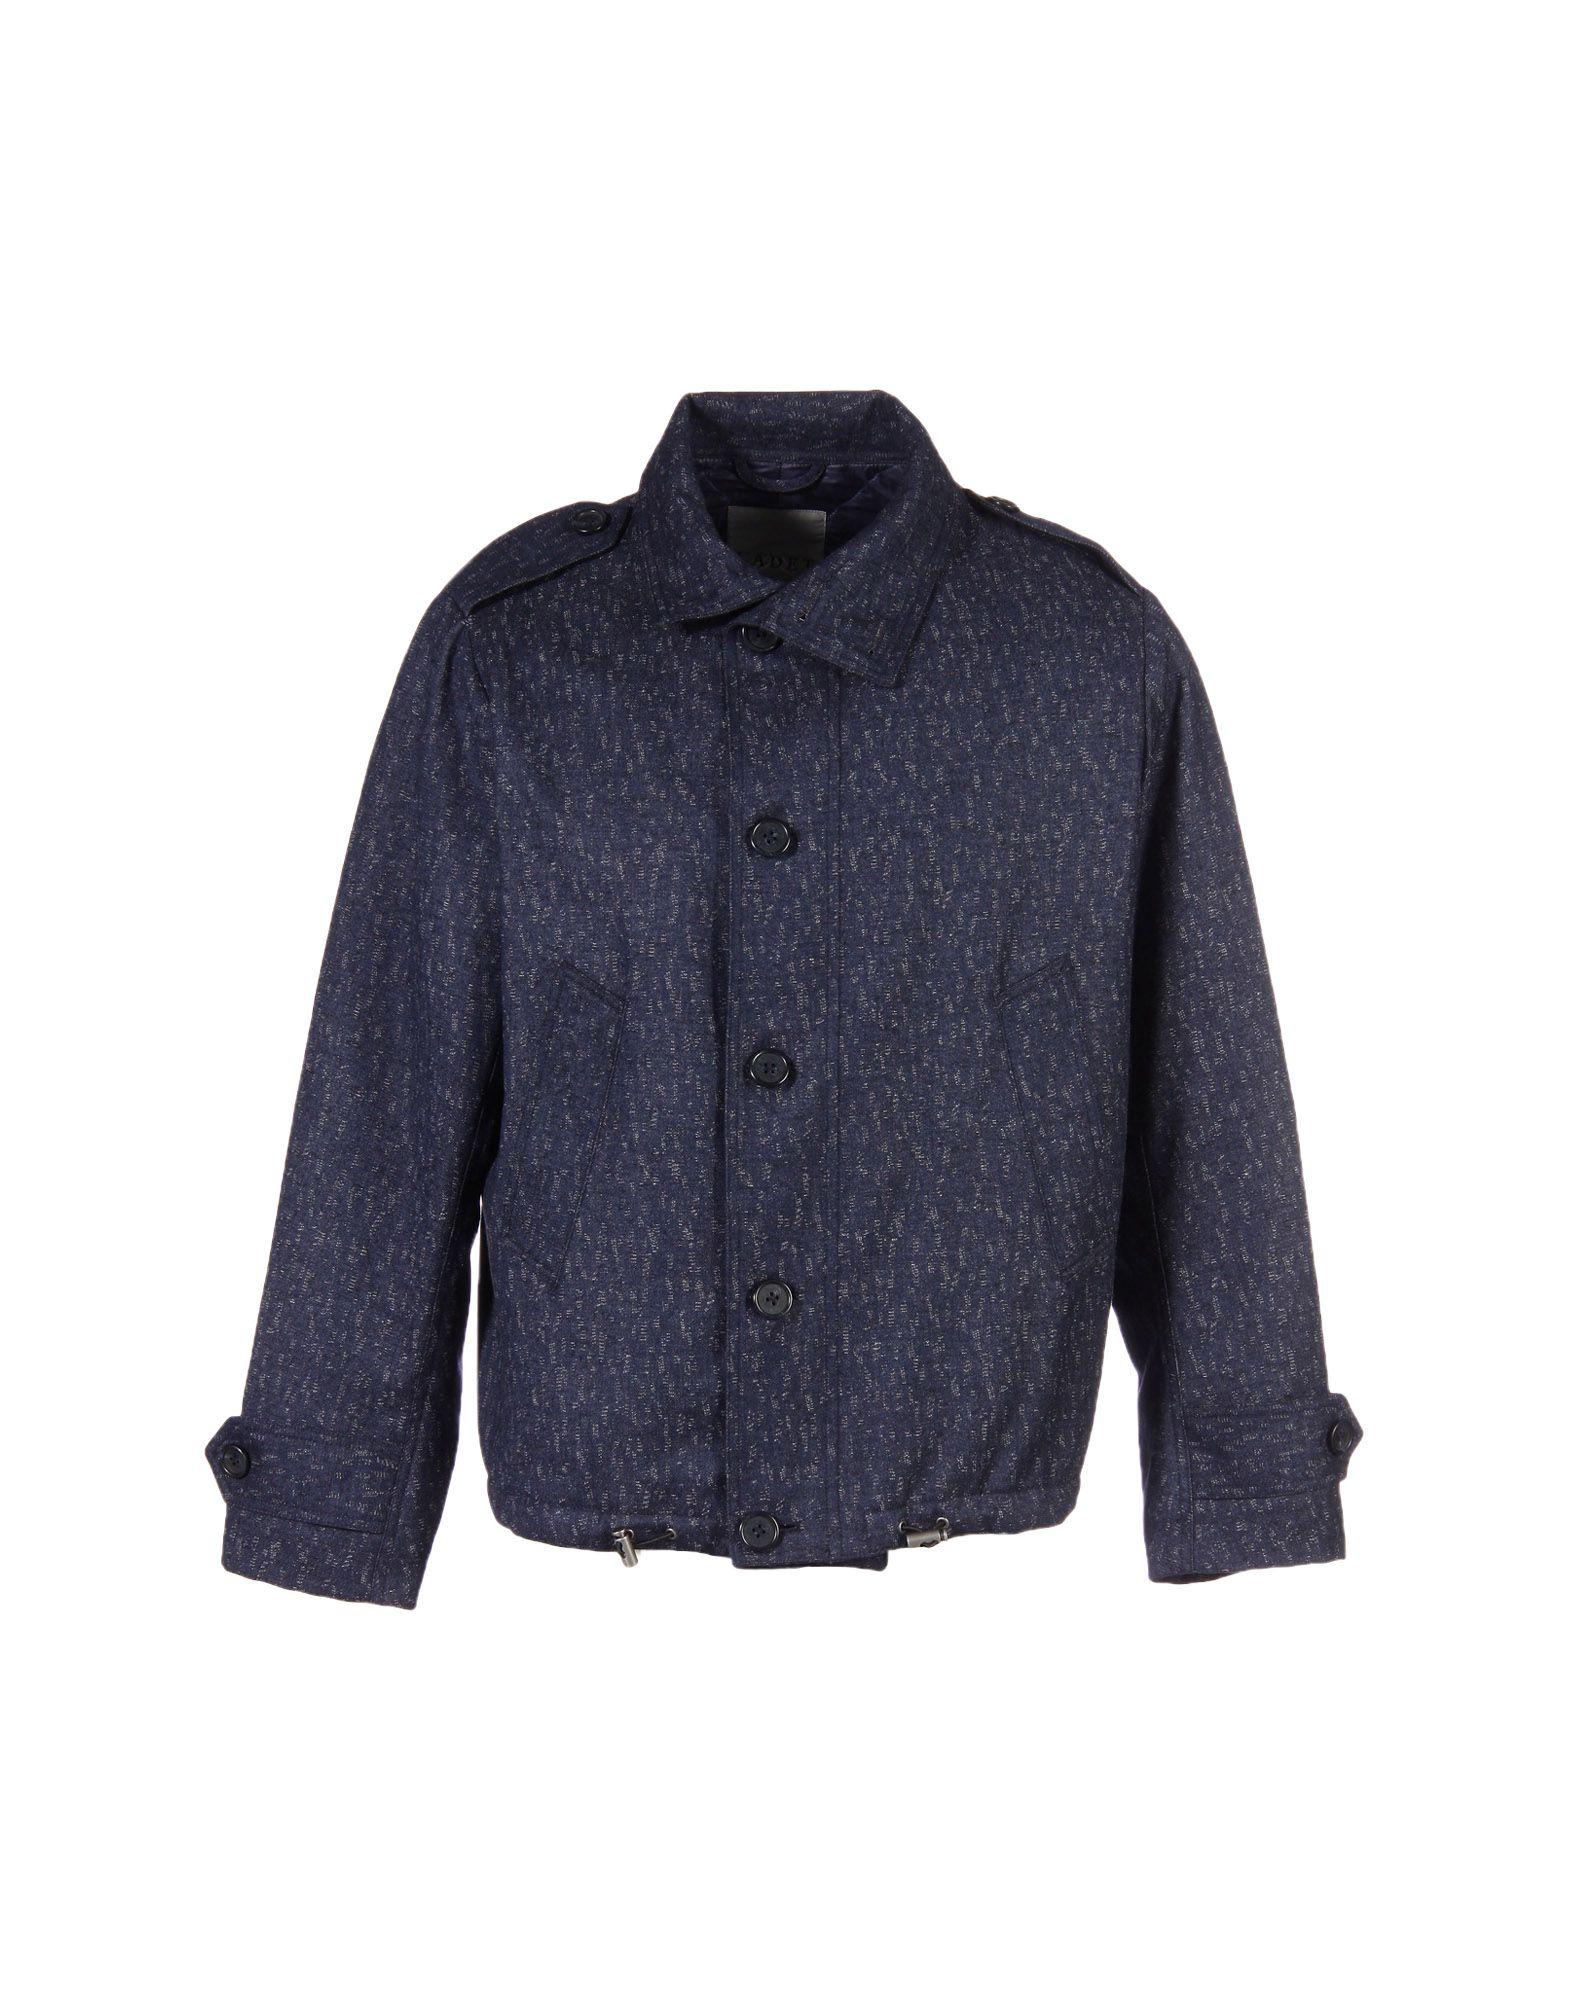 CADET Jackets in Dark Blue